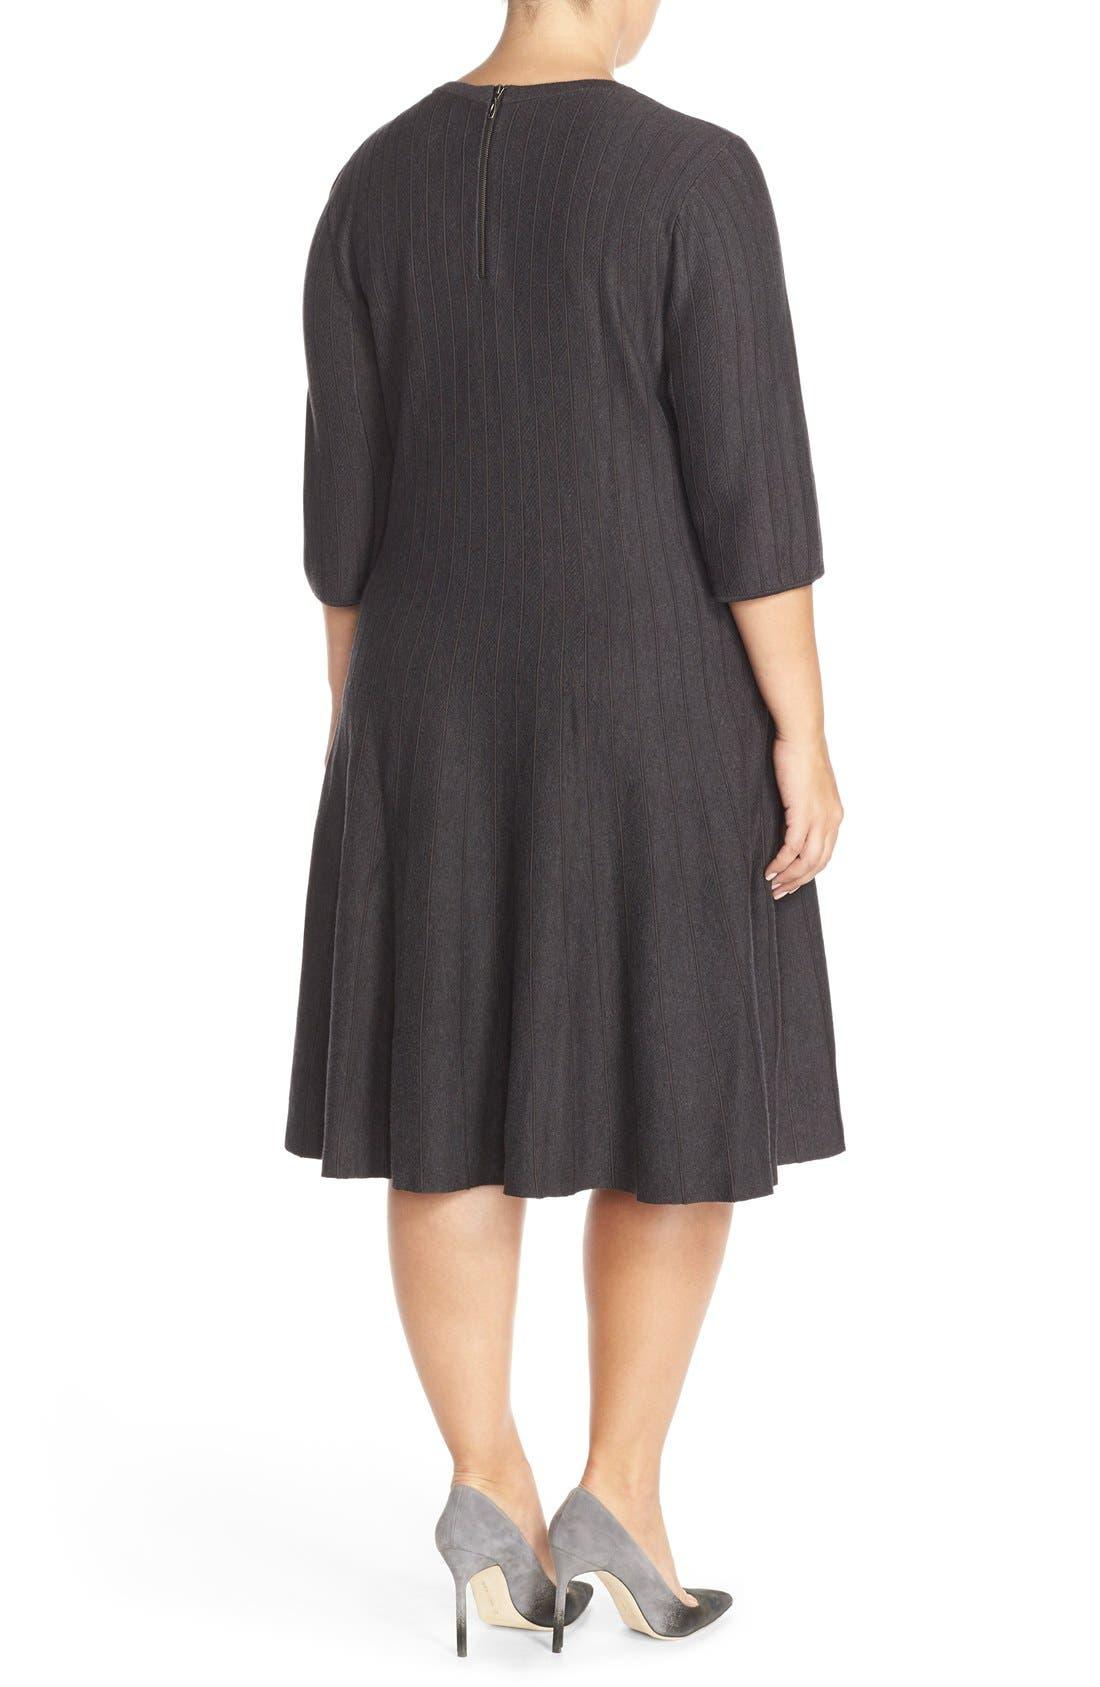 'Twirl' Elbow Sleeve Knit Fit & Flare Dress,                             Alternate thumbnail 3, color,                             Phantom Heather